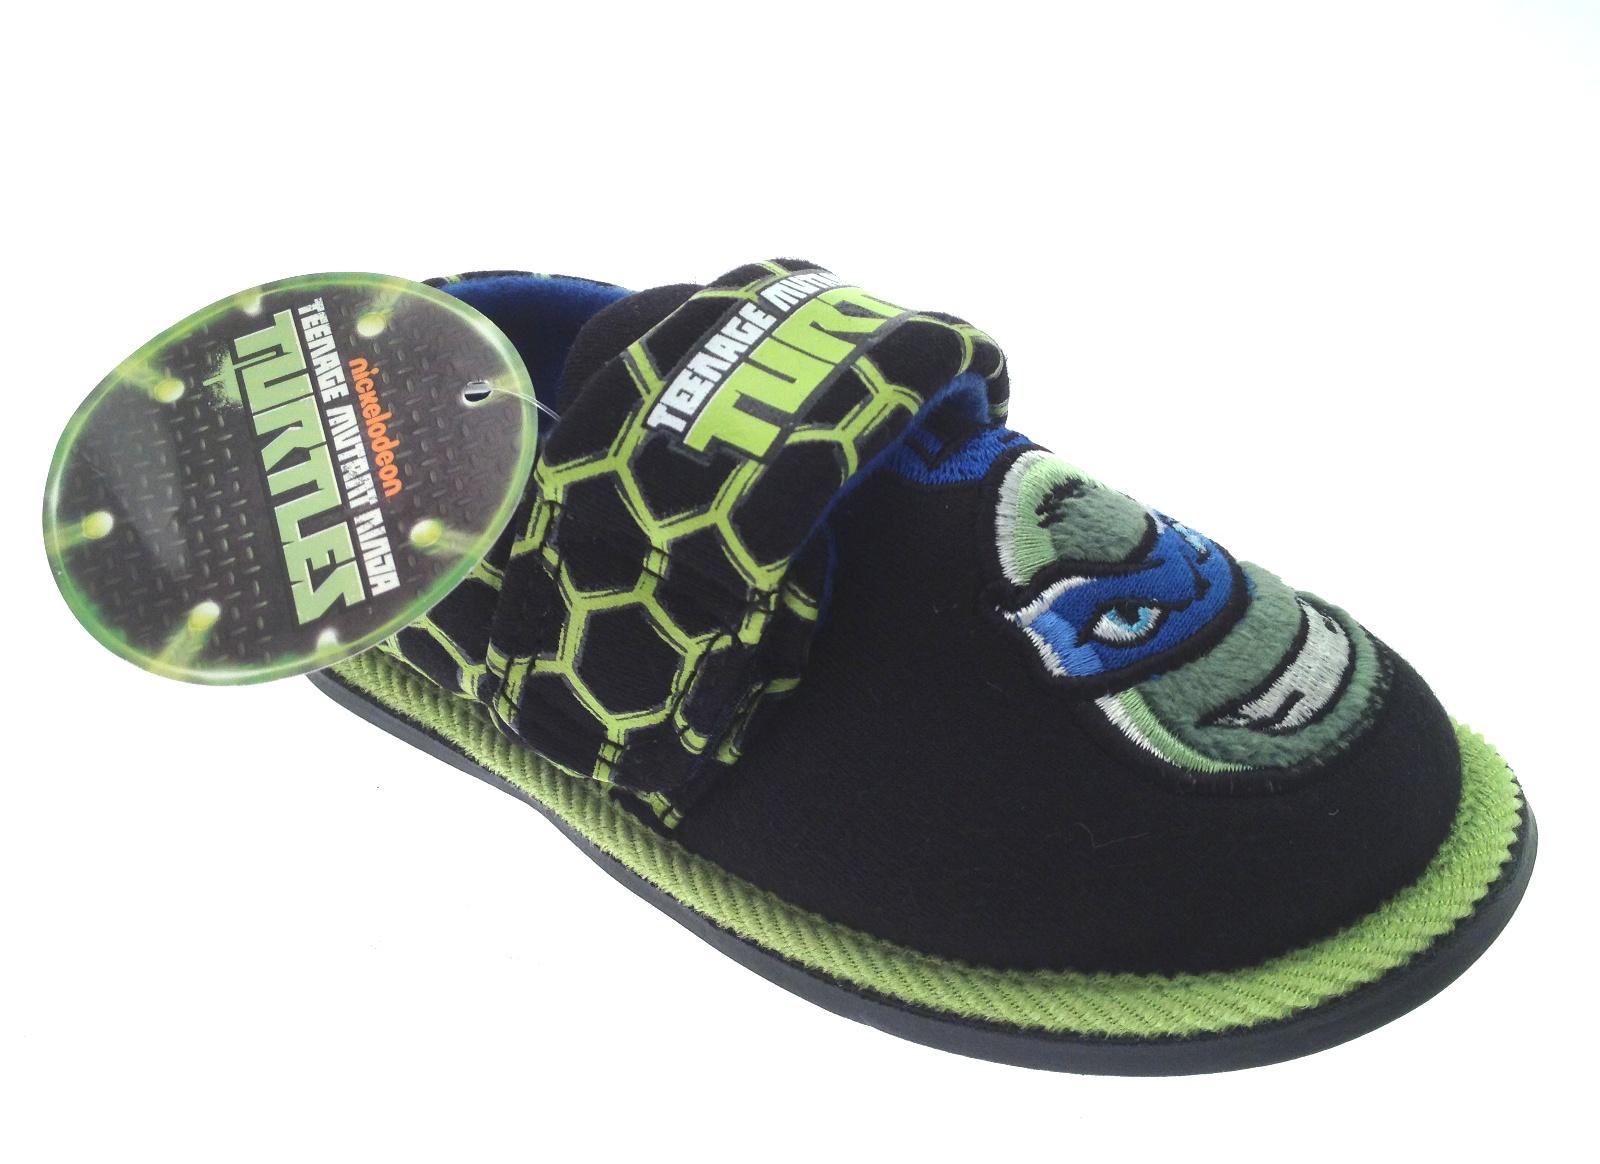 Mutant Ninja Turtles Child/'s Size 910 Slippers